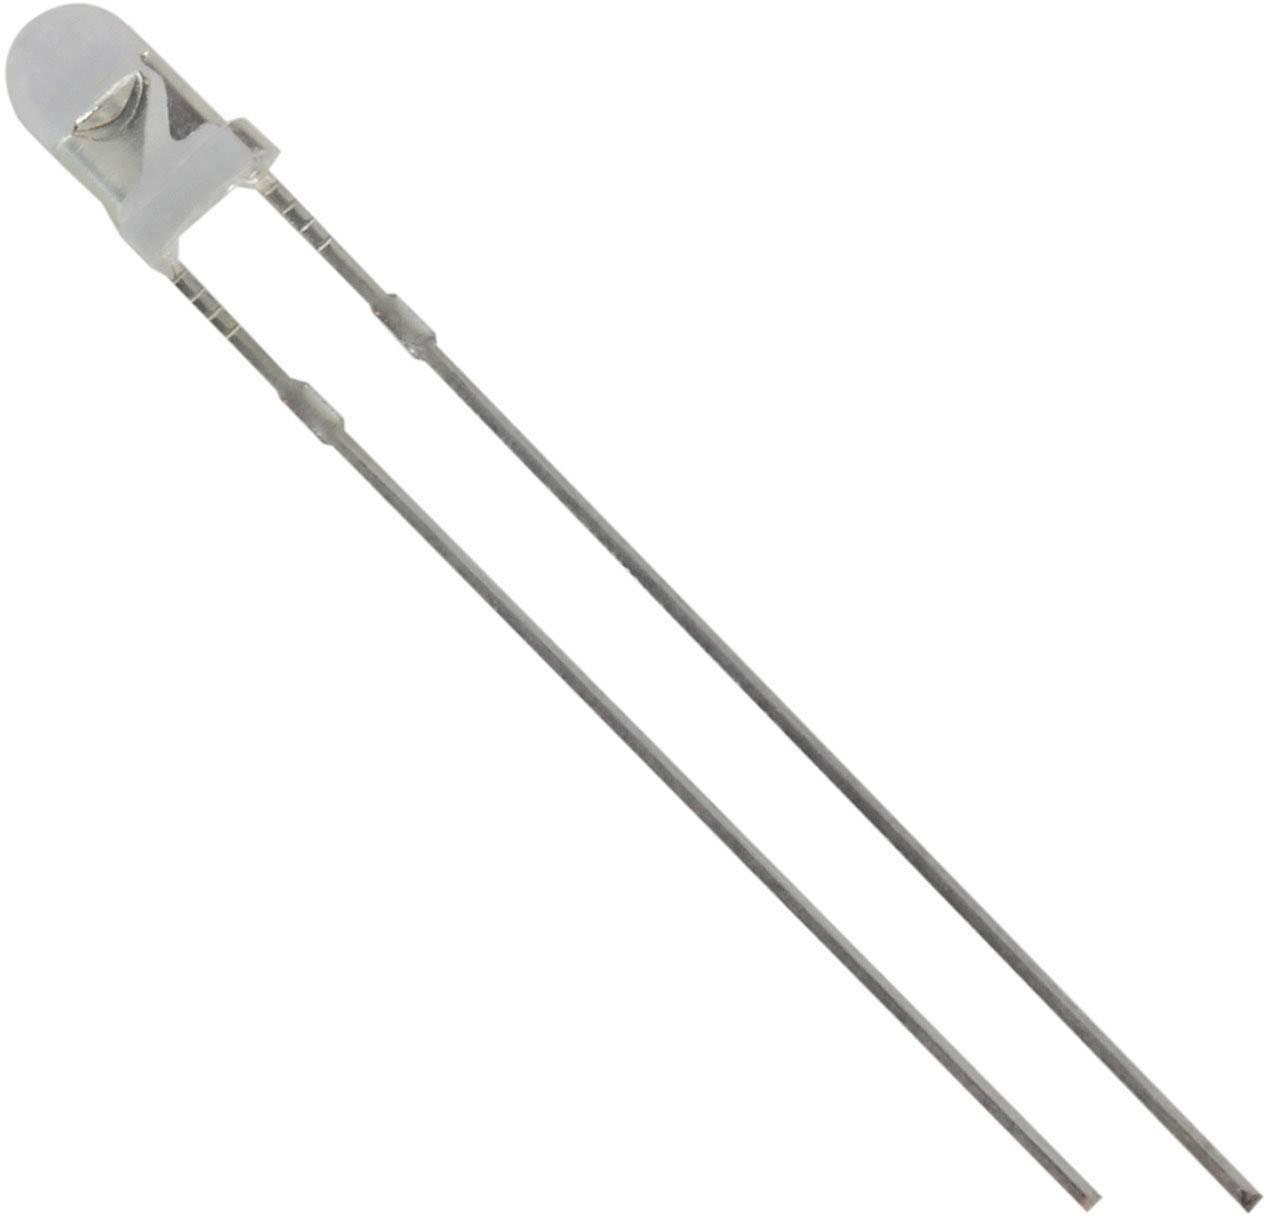 LED s vývody HuiYuan 3034B2C-CSB-A, typ čočky kulatý, 3 mm, 25 °, 20 mA, 1800 mcd, 3.1 V, modrá